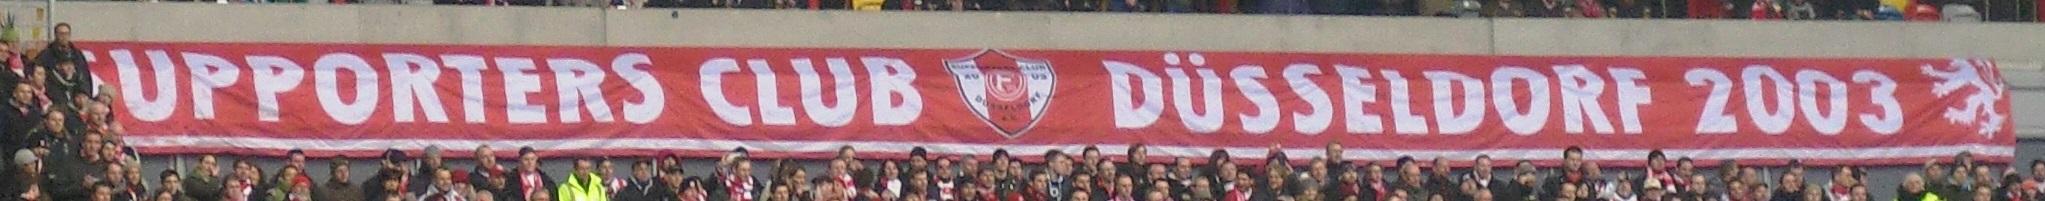 Supporters Club Düsseldorf 2003